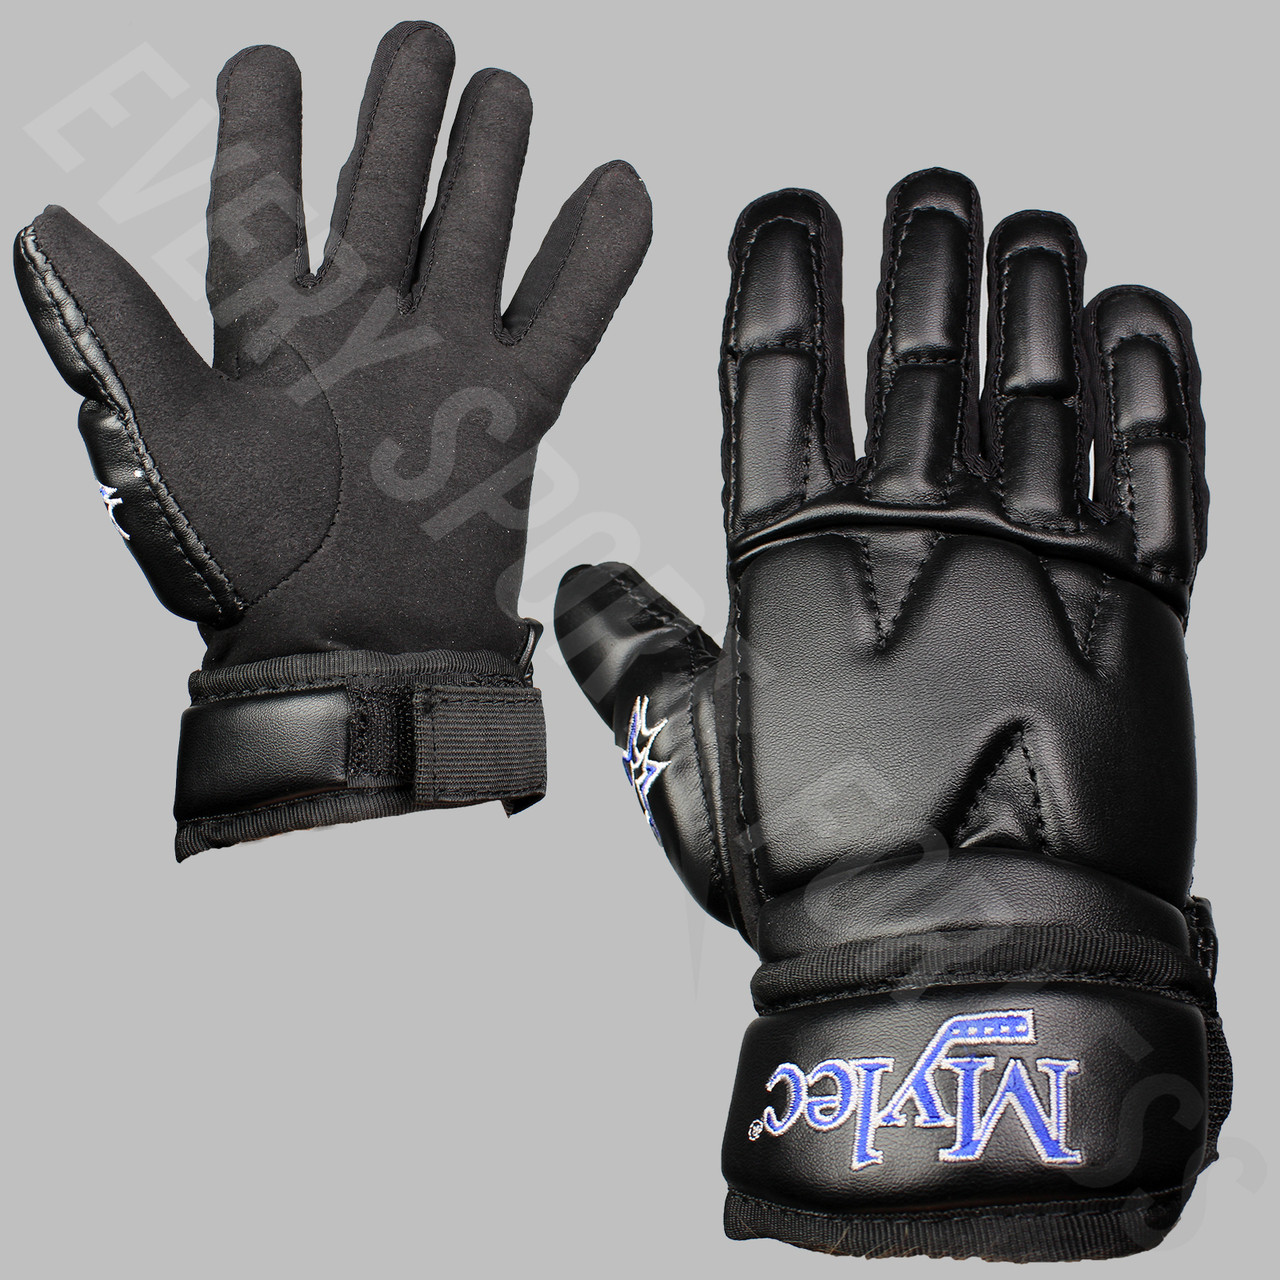 5c8cb63fbde Mylec Street Hockey Gloves - Black